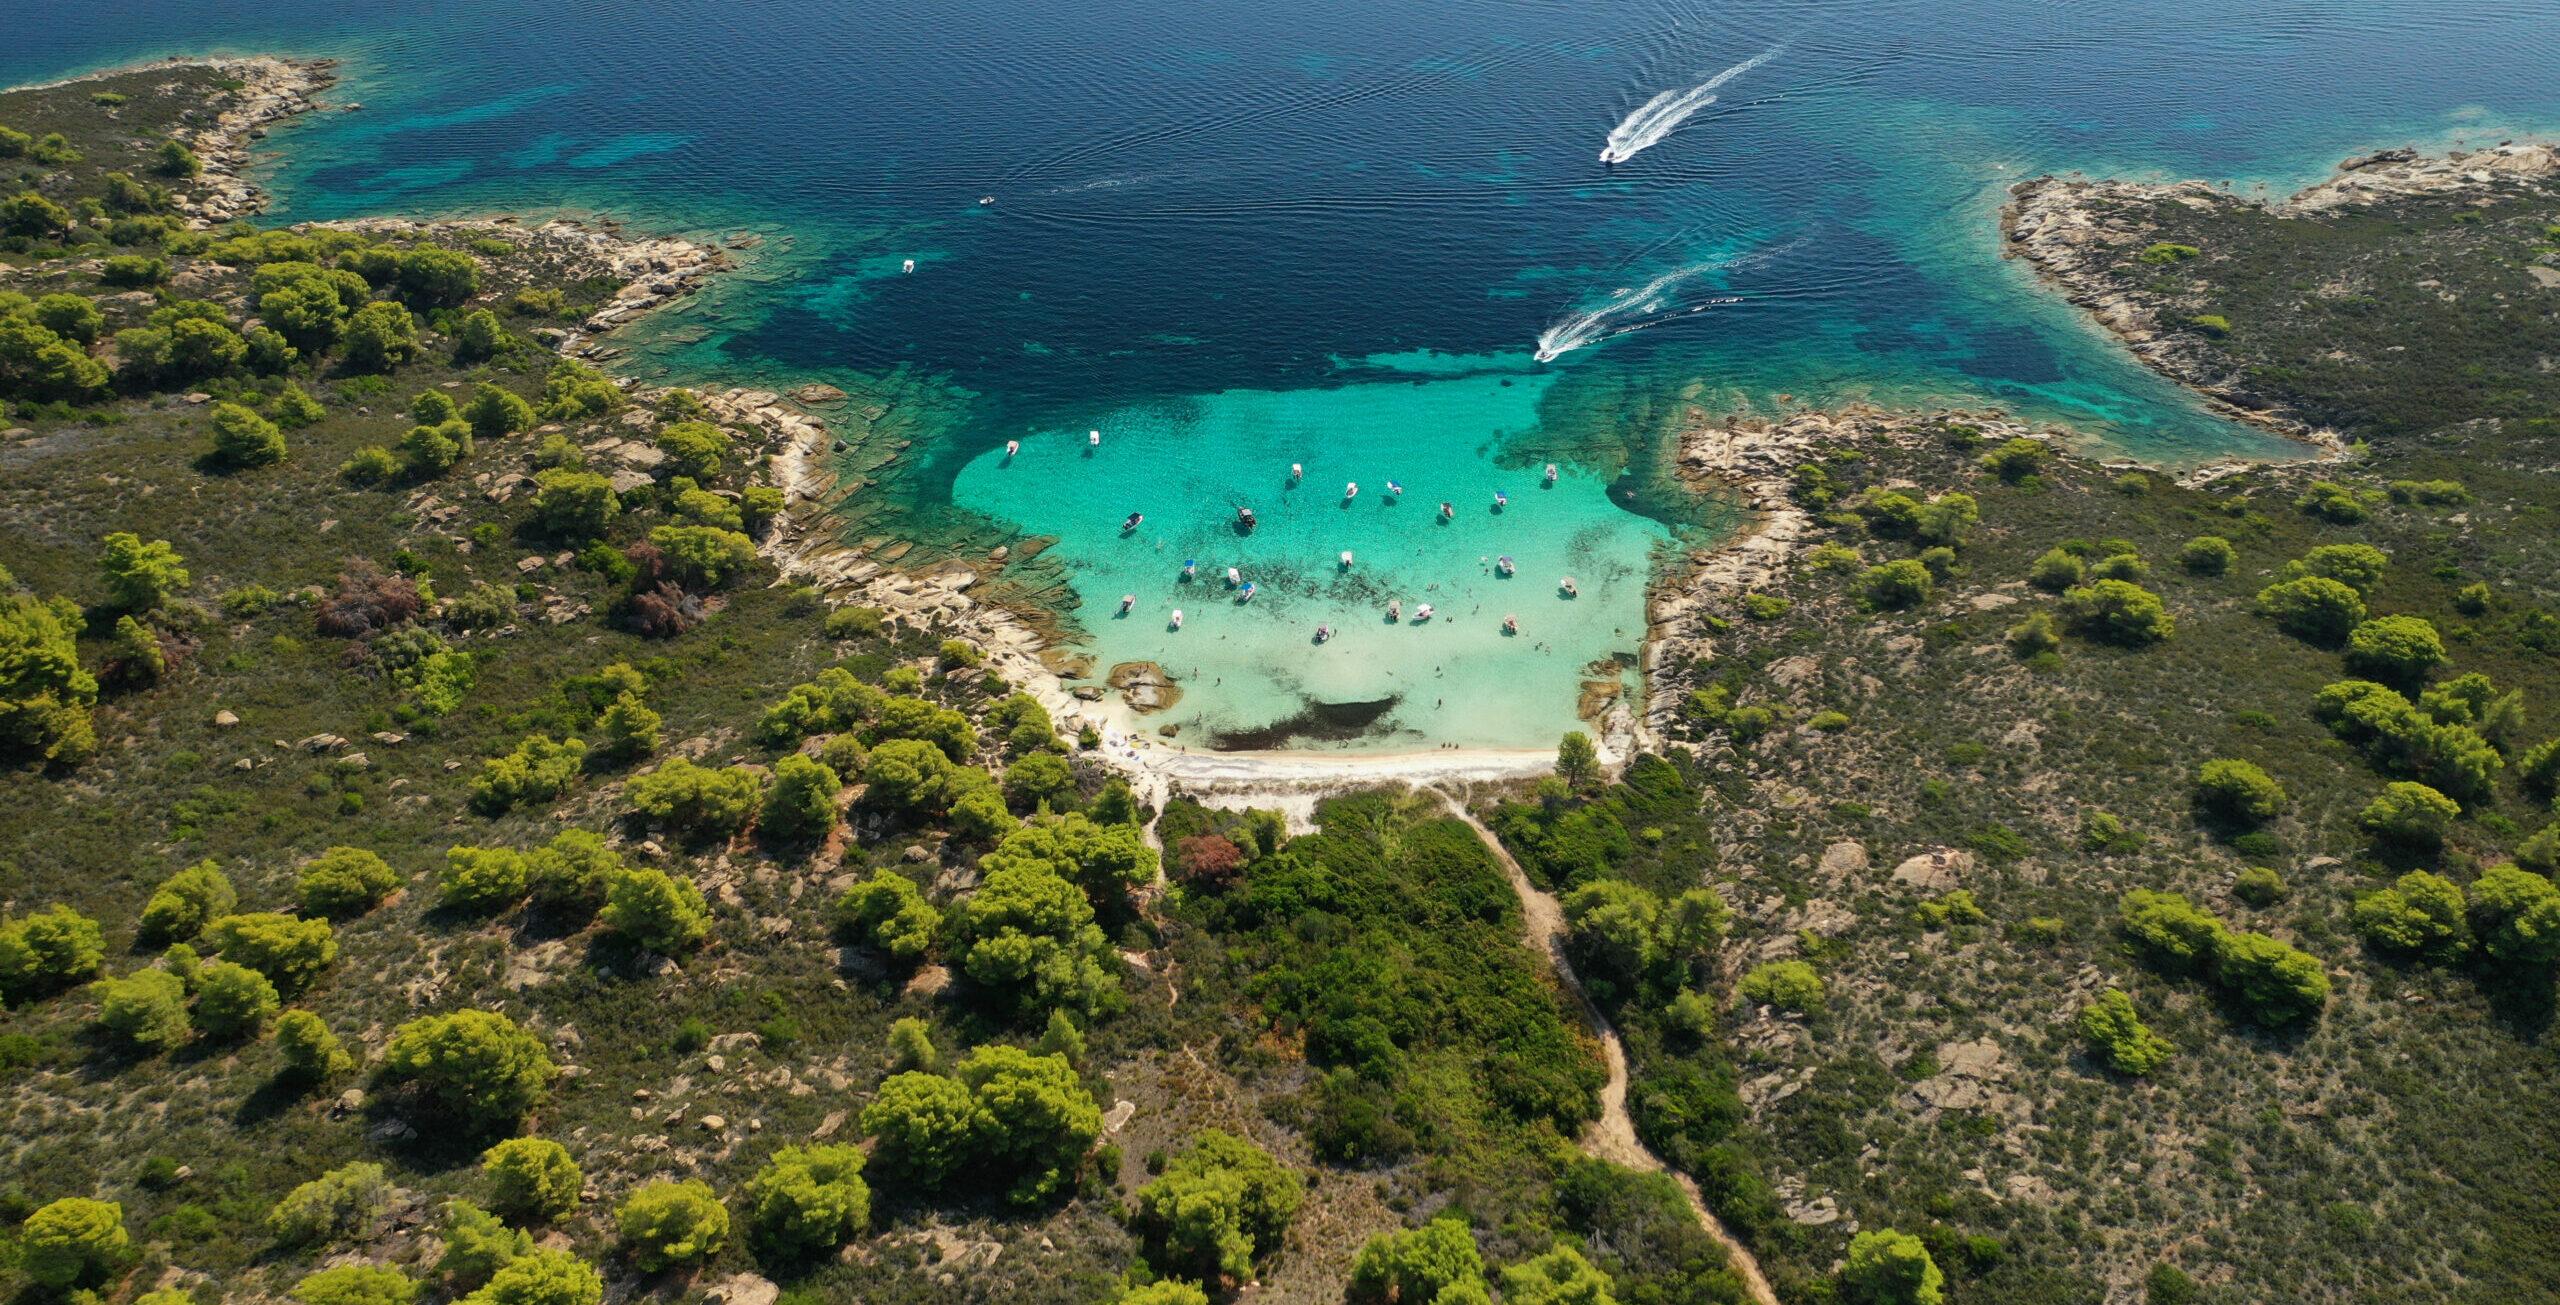 Halkidiki: Lefki beach, The Hawaii of Greece